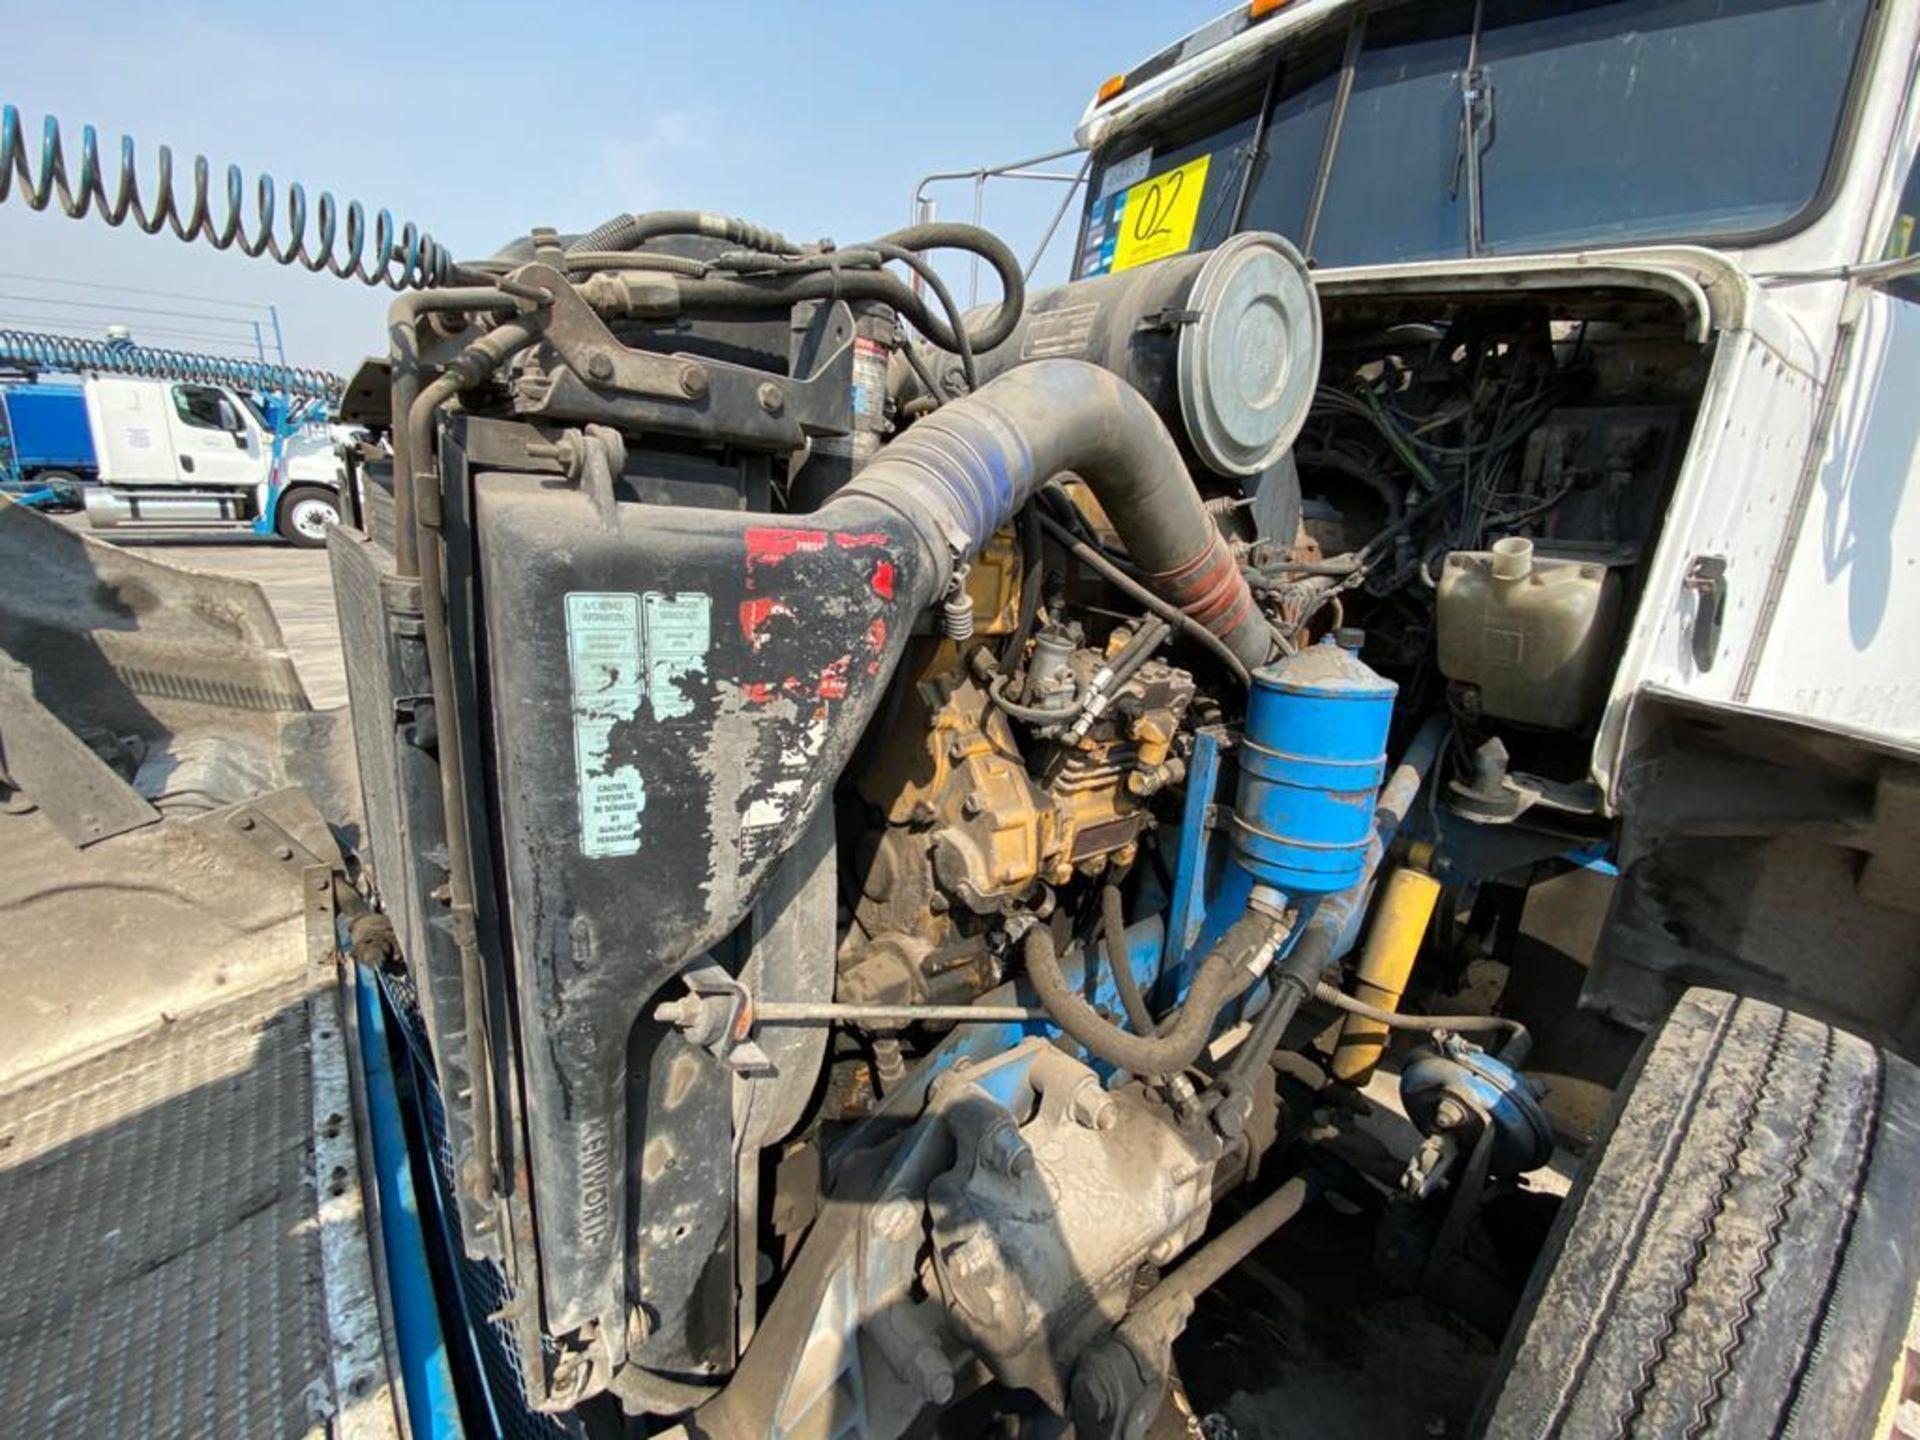 1999 Kenworth Sleeper truck tractor, standard transmission of 18 speeds - Image 61 of 75